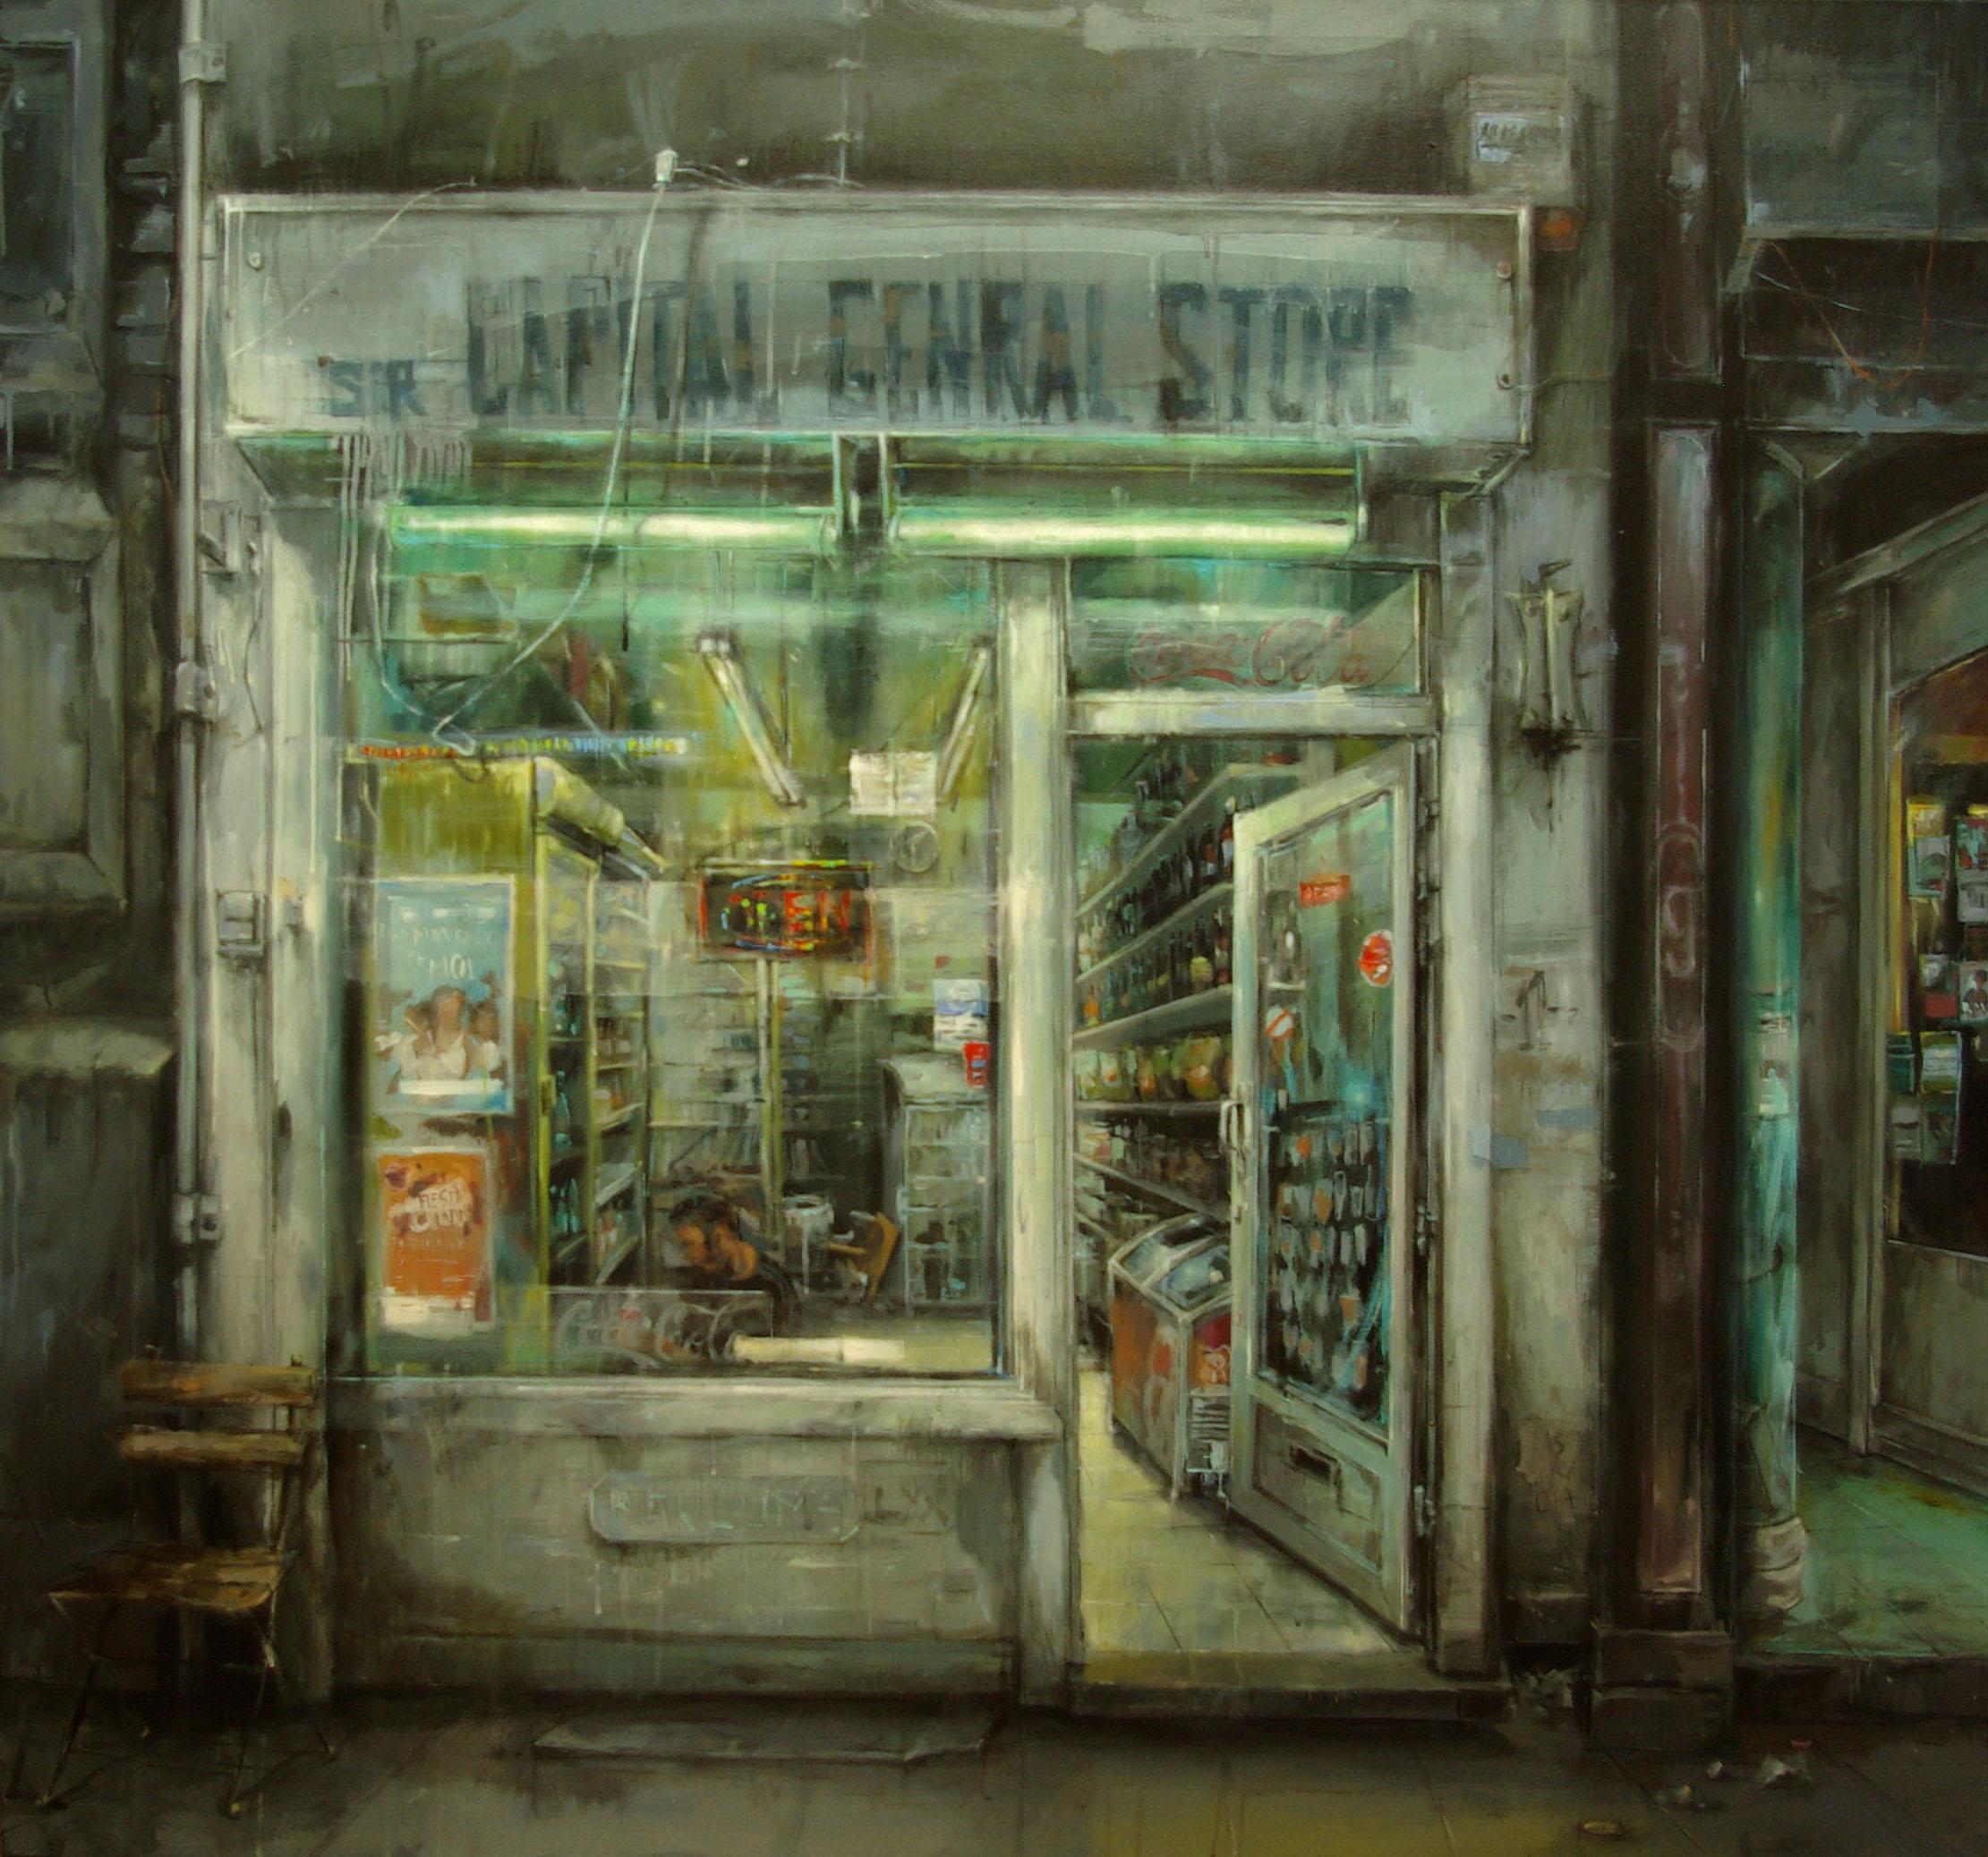 Sir Capital Genral Store.